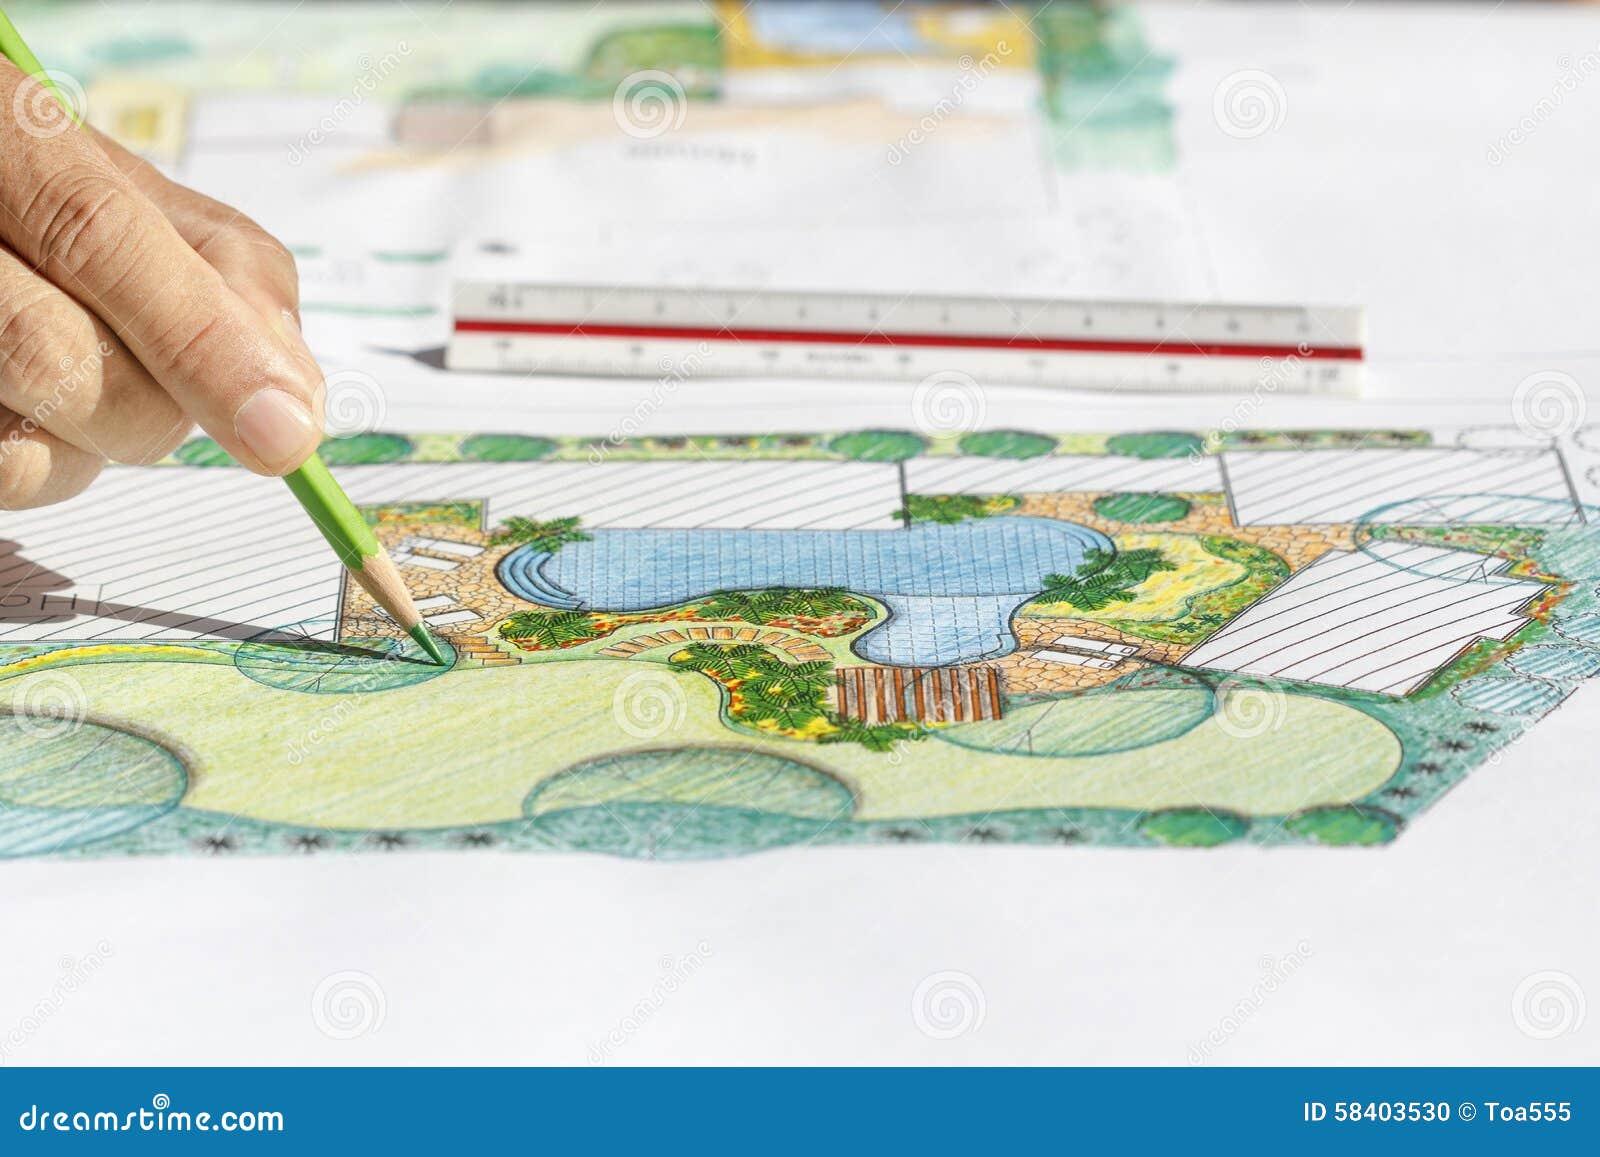 Landscape architect design backyard plan for villa stock for Plan landscape my yard